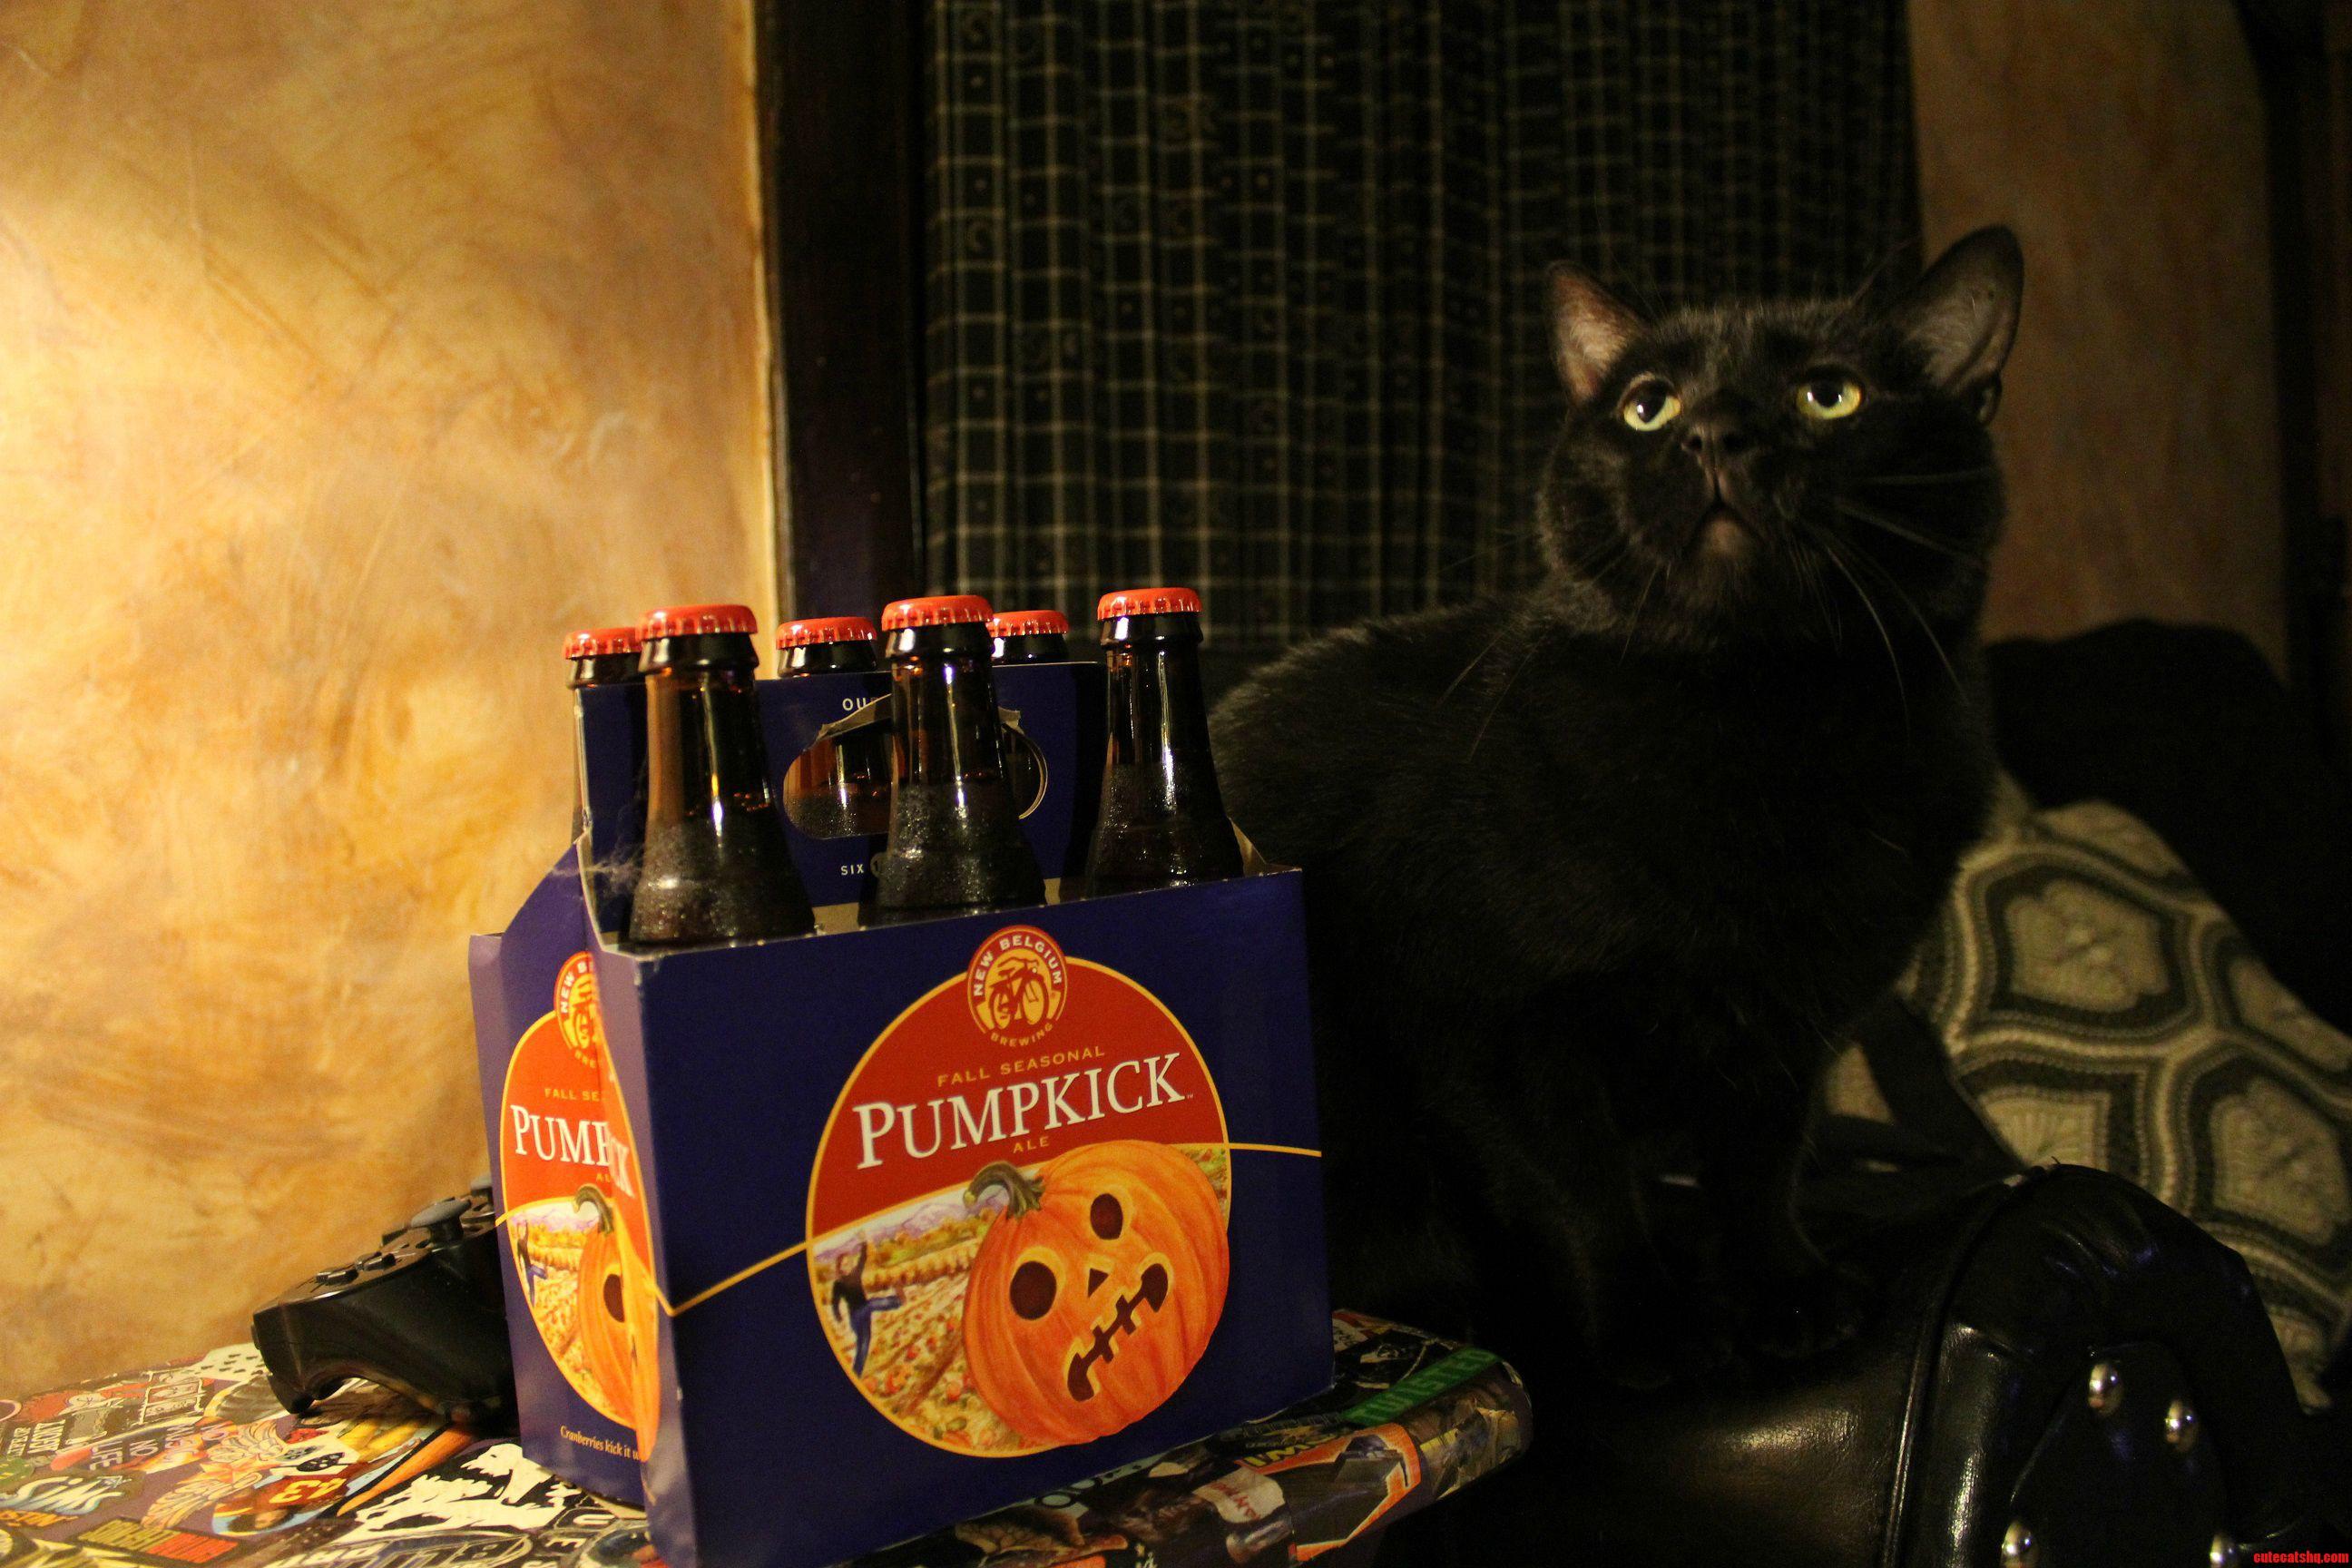 Wylde Next To Pumpkick New Belgium Fall Seasonal Ale